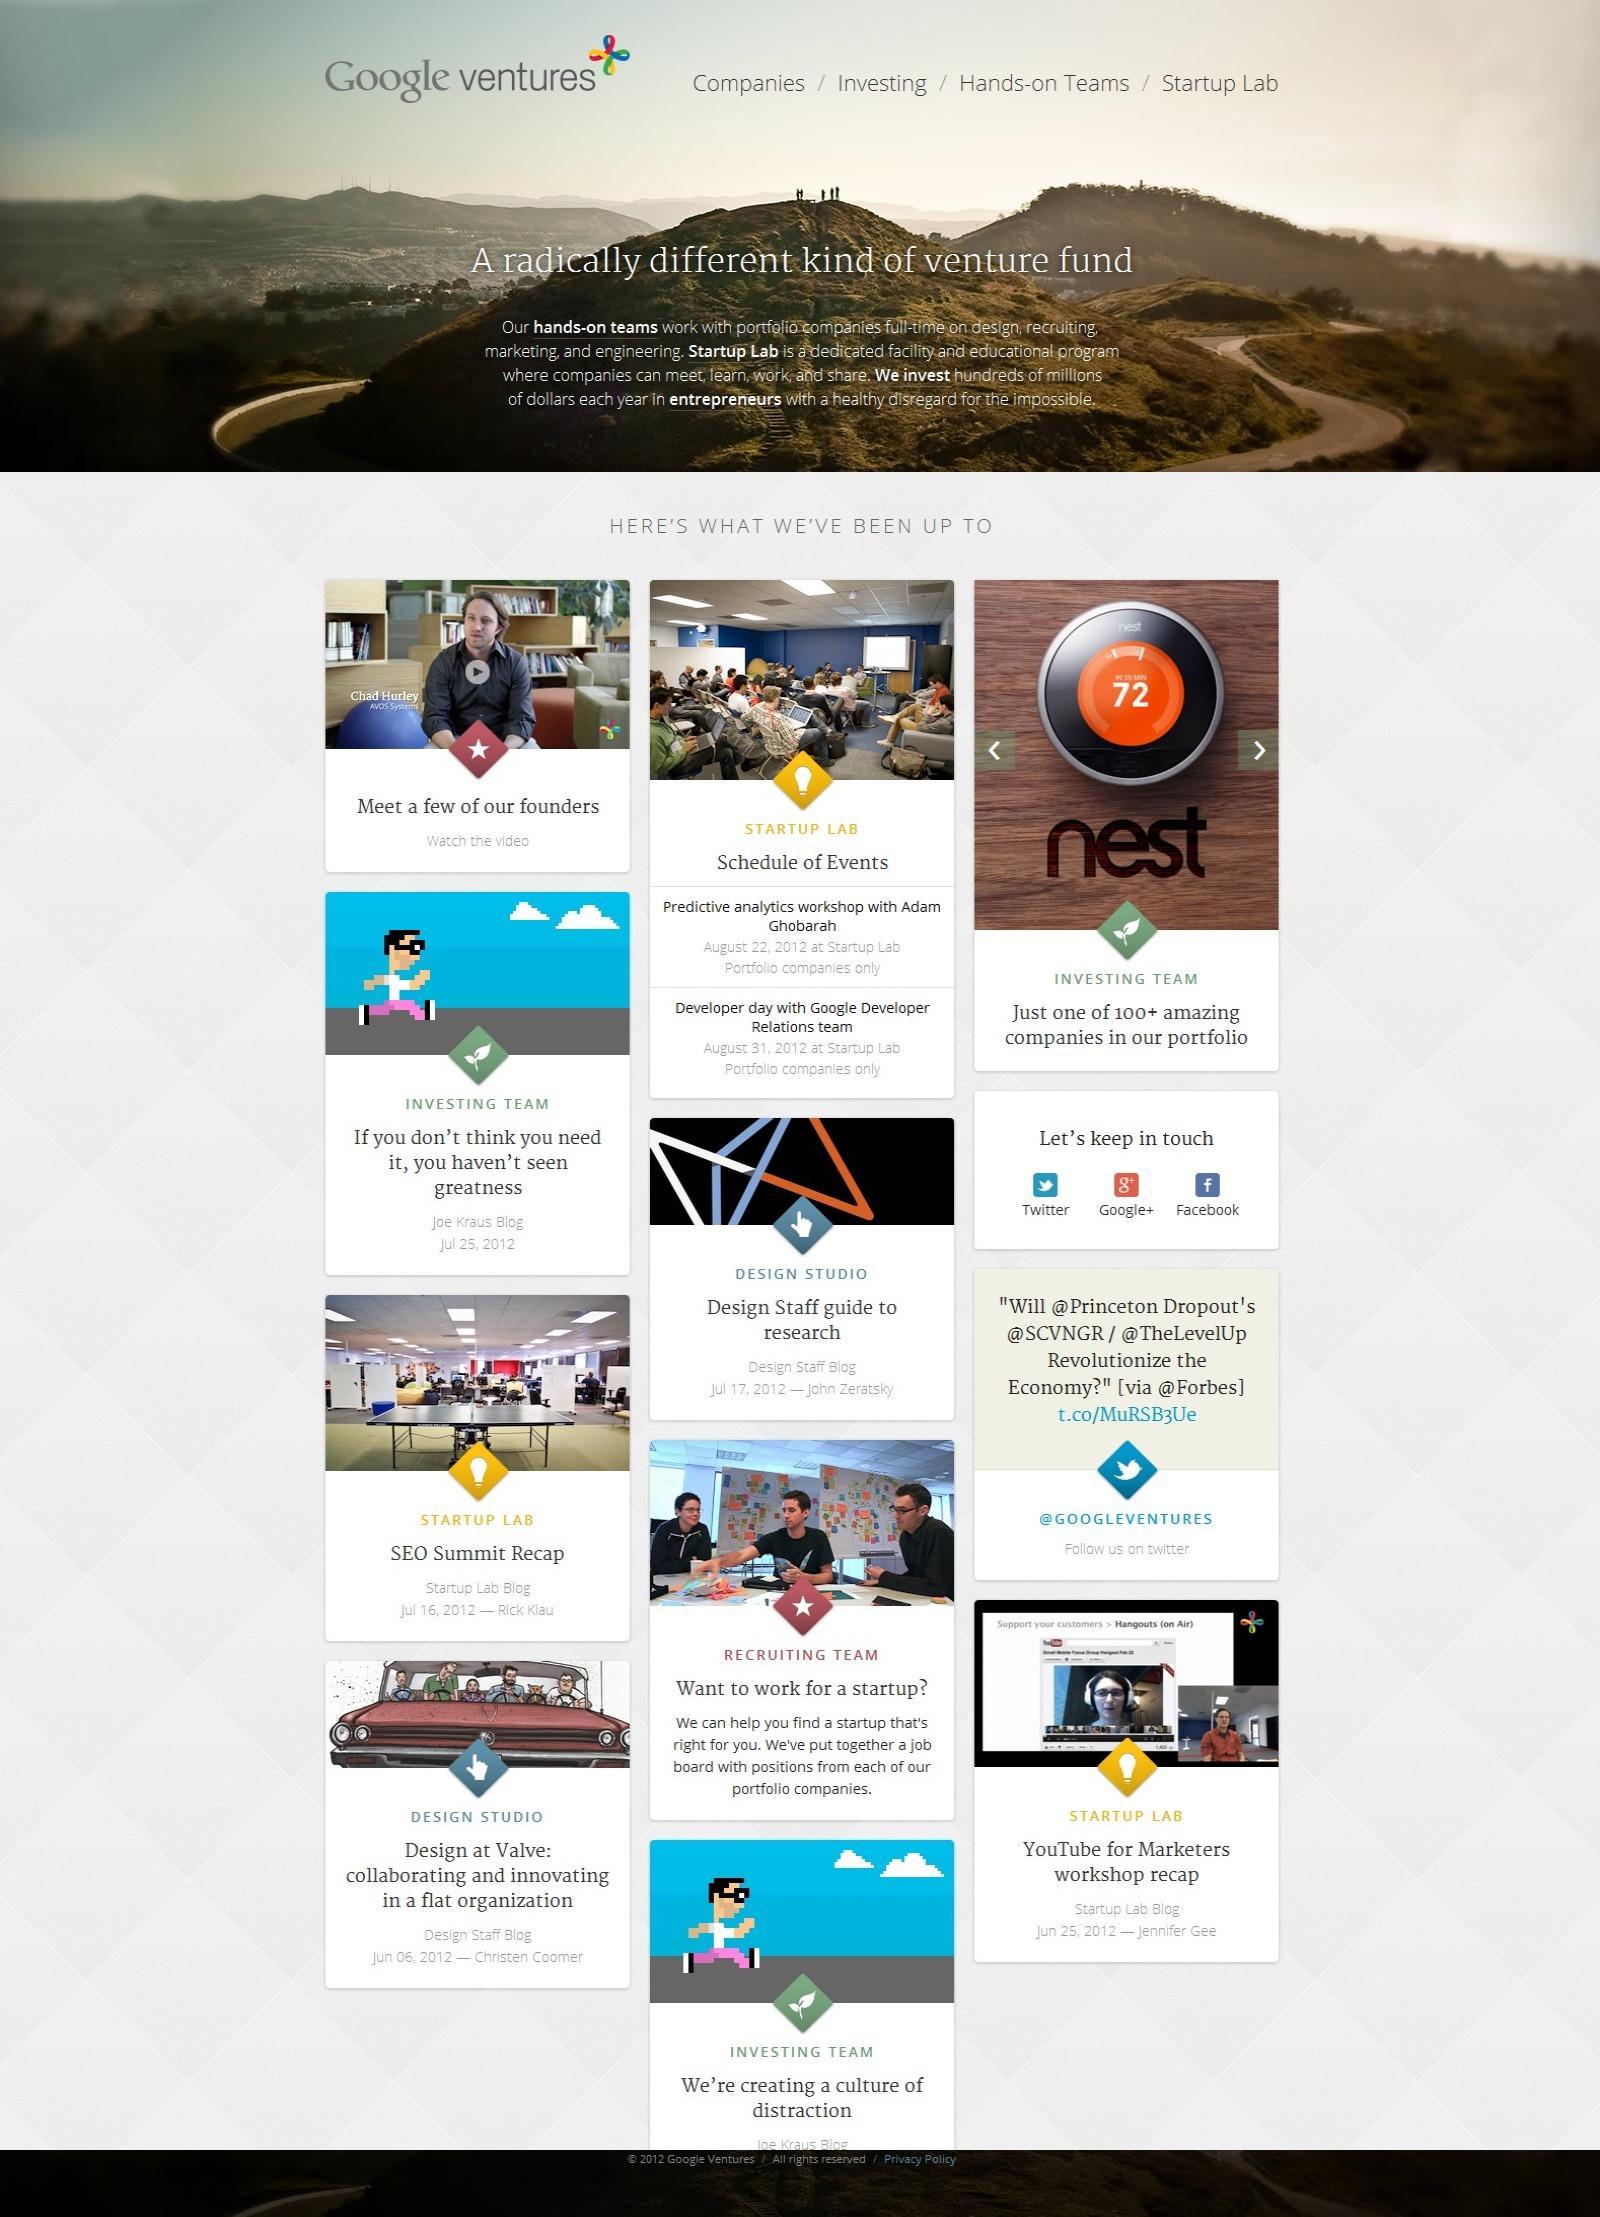 imm.io - www.googleventures.com